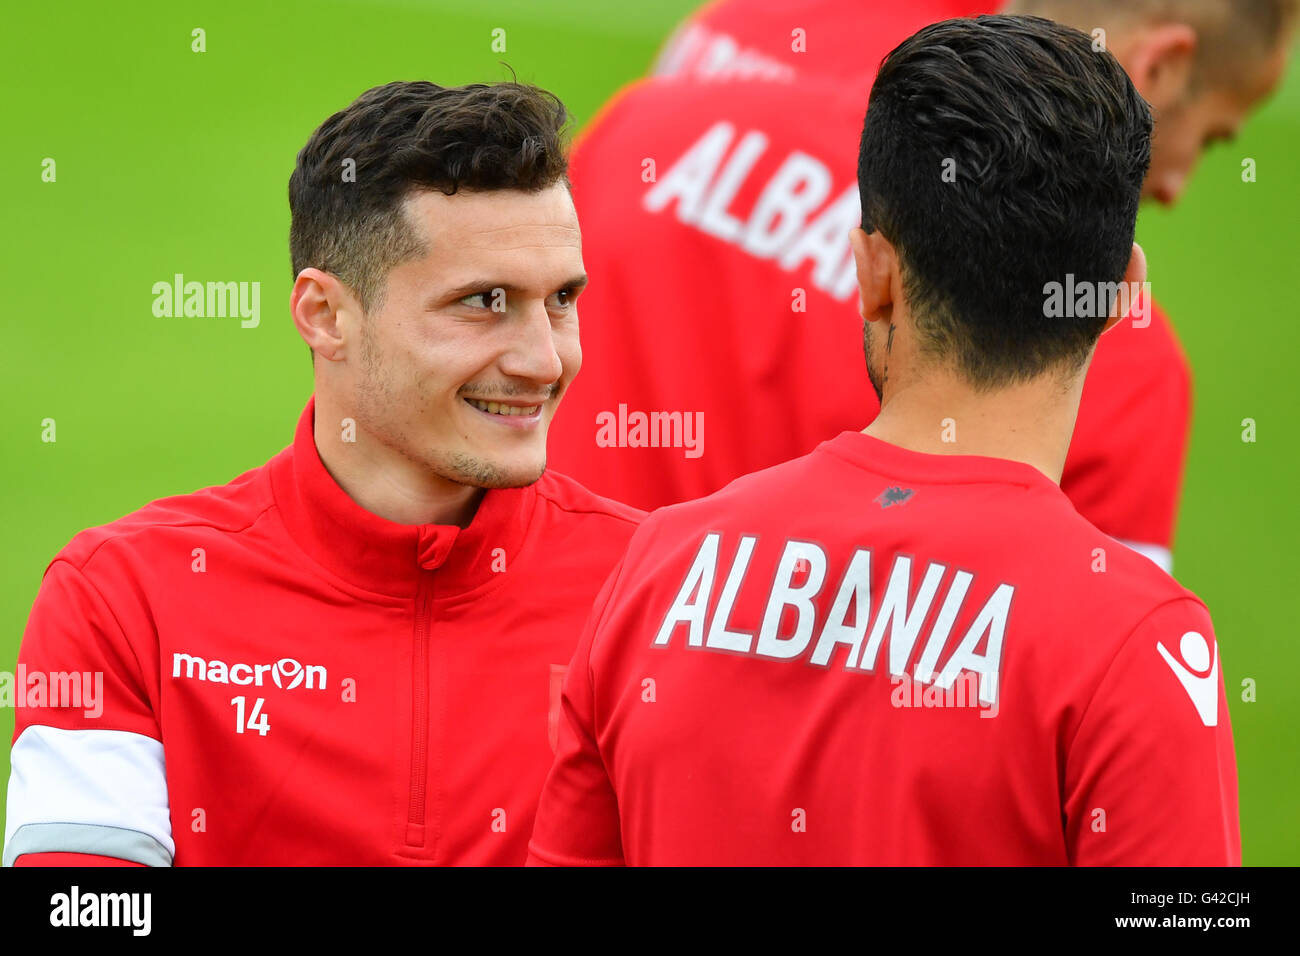 Taulant Xhaka (L) of Albania during a team training session at the transfer training ground Plaine de jeux de Gerland Stock Photo